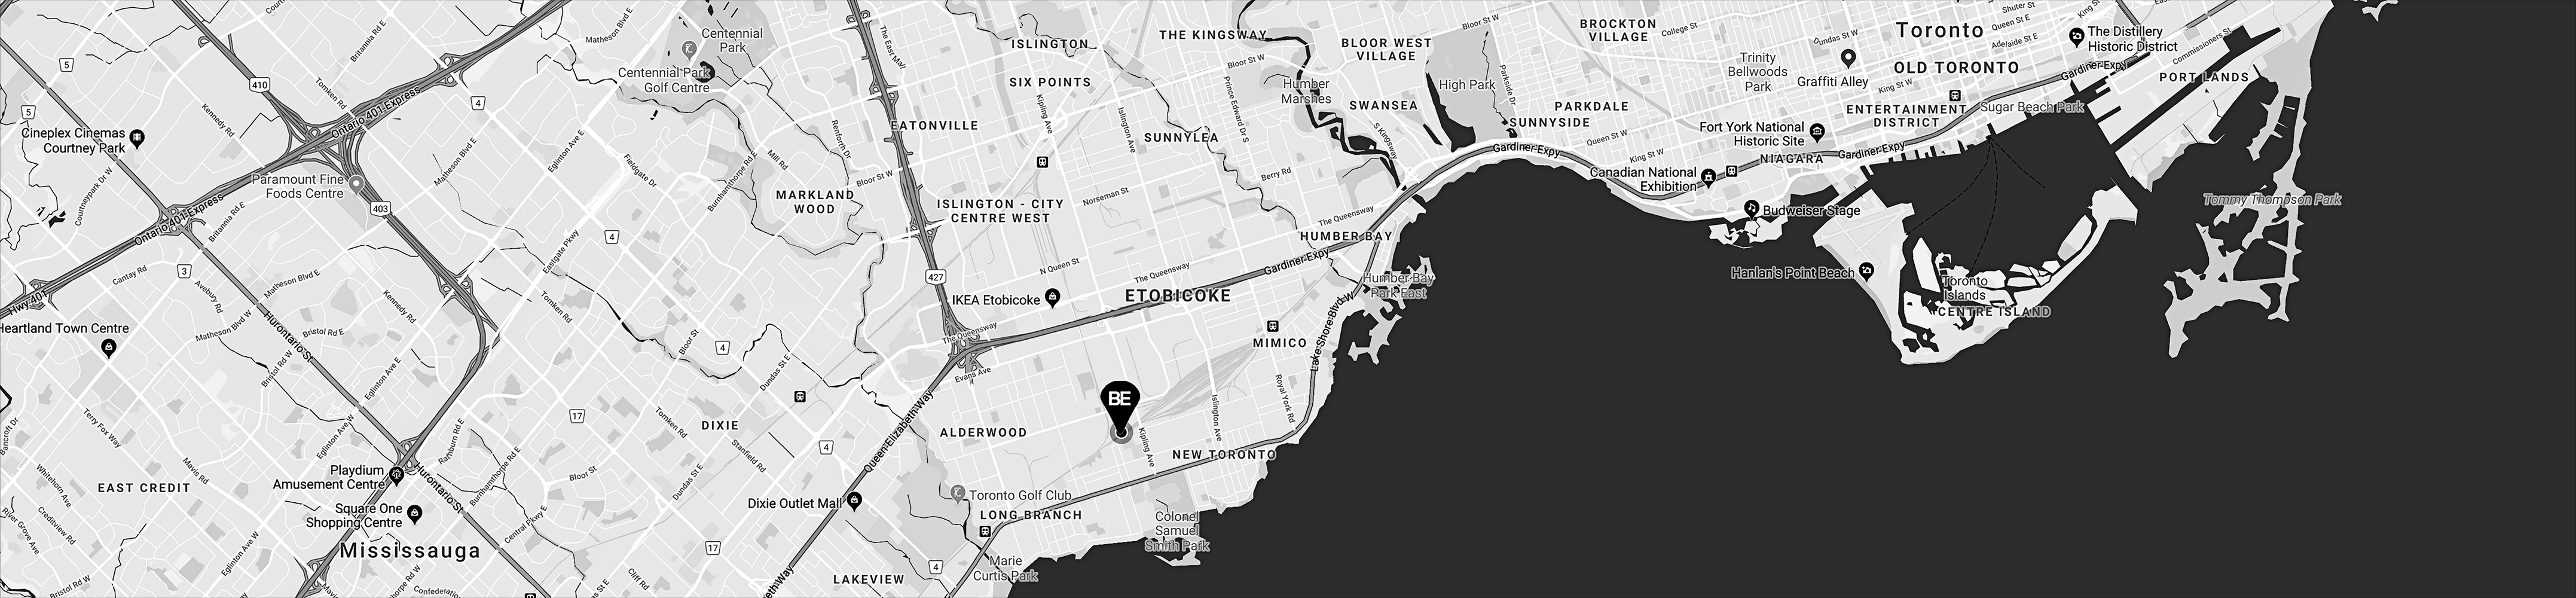 Studio Page Map I